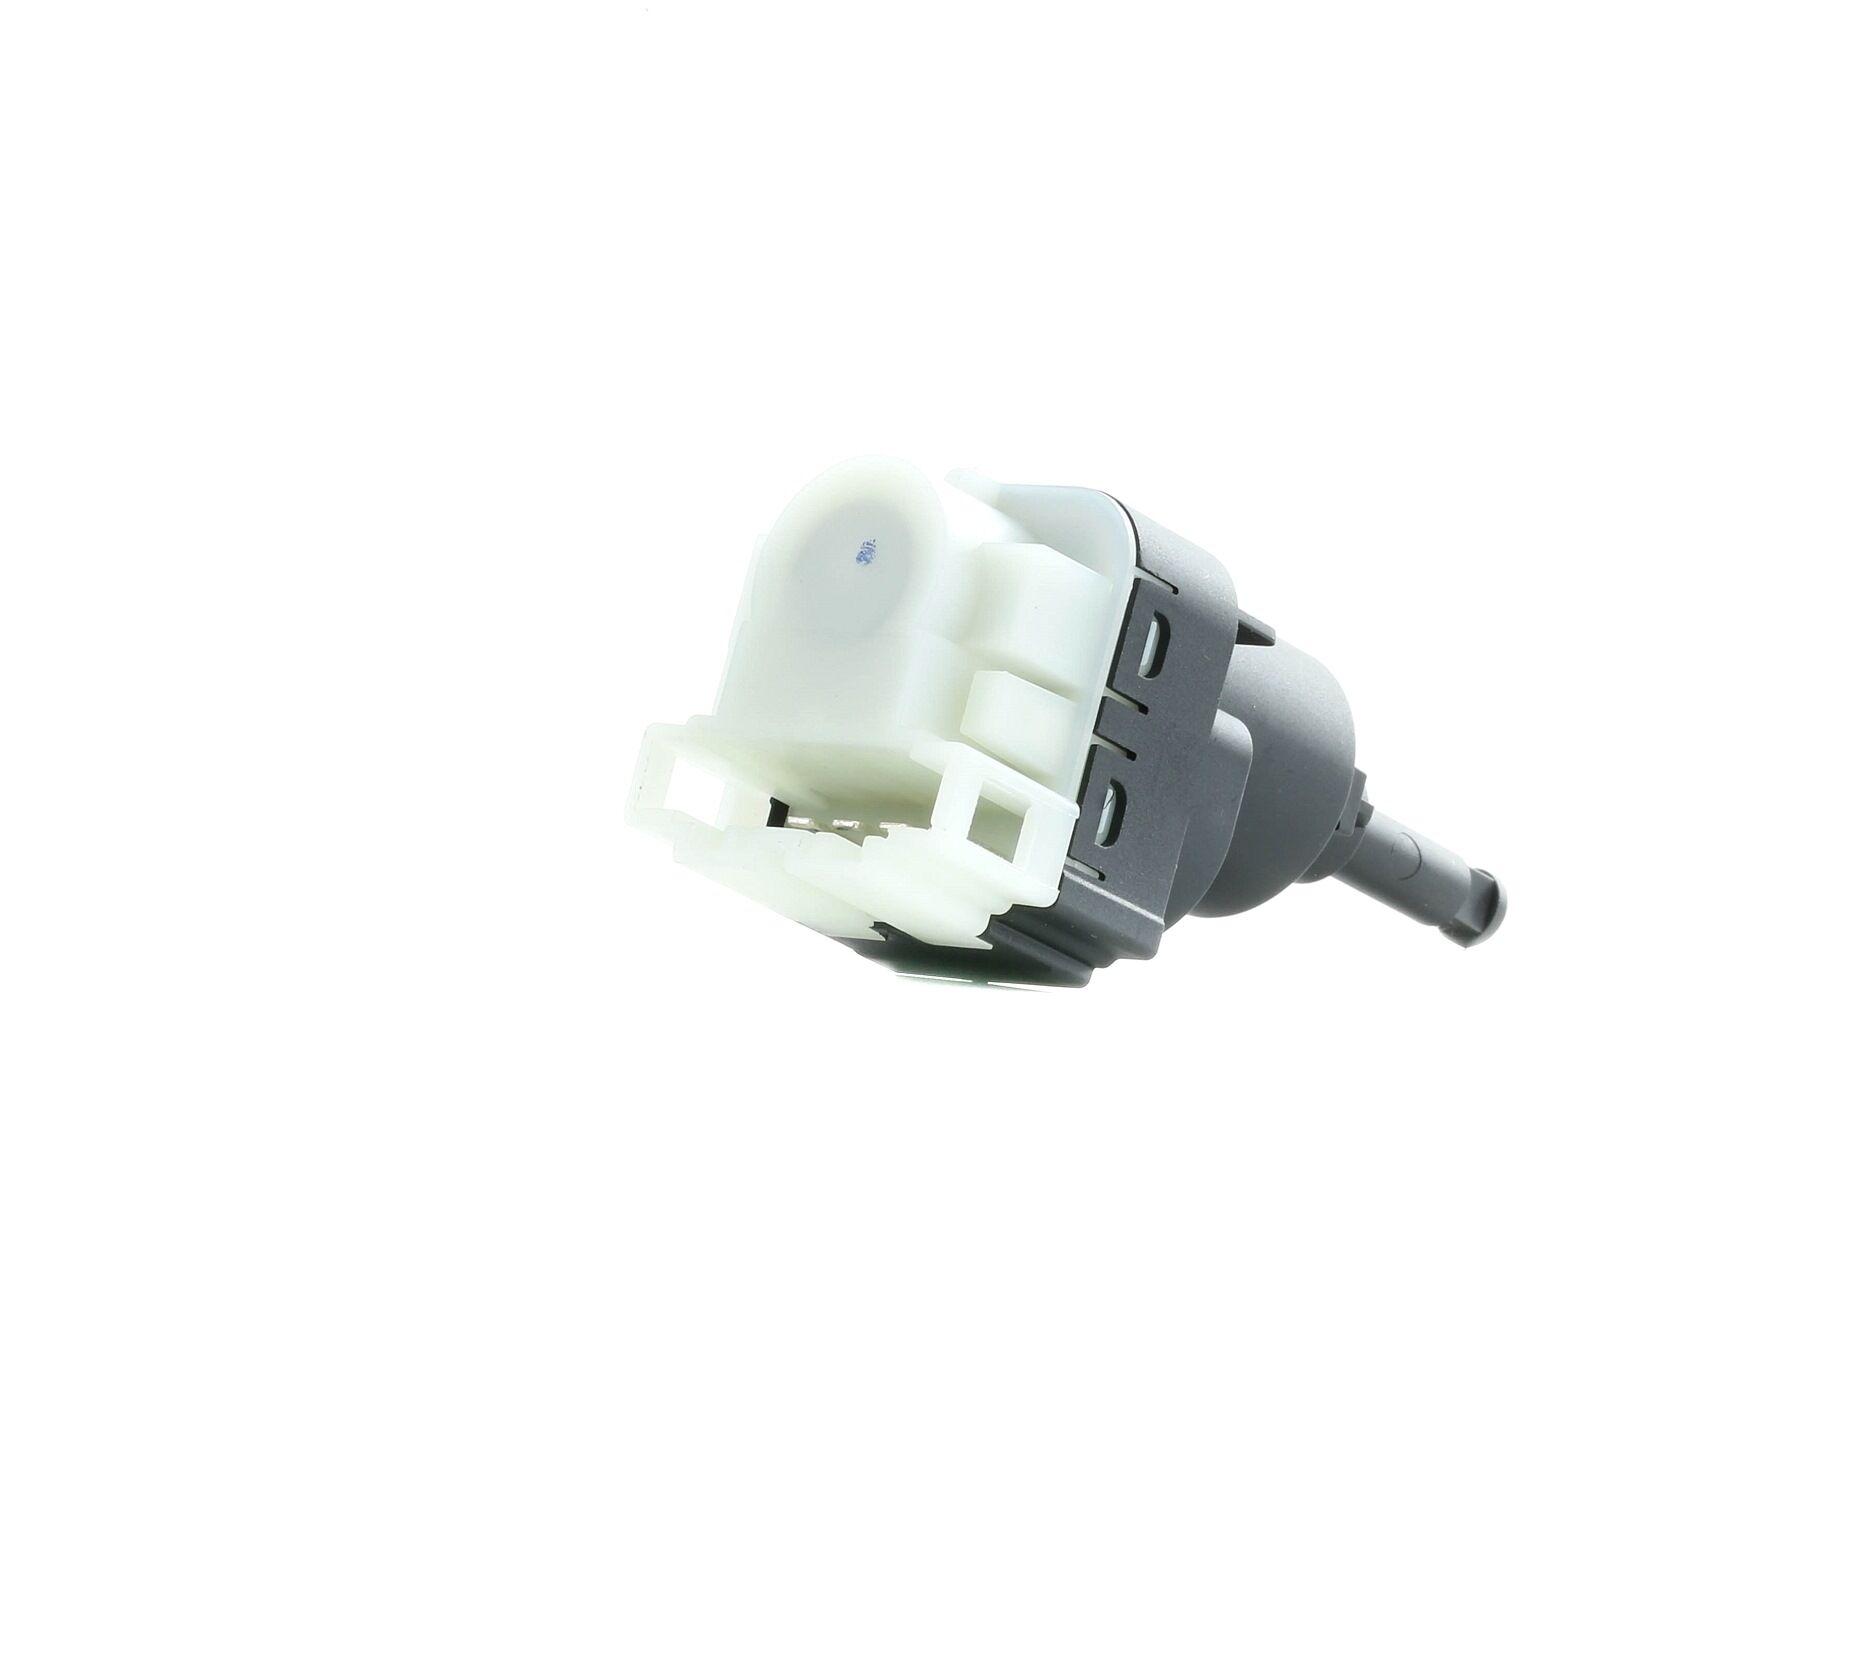 VEMO Interrupteur des feux de freins VW,AUDI,SKODA V10-73-0158 1K2945511,1K2945511NAR,1K2945511RDW 3B0945511,3B0945511A,3B0945511B,3B0945511C